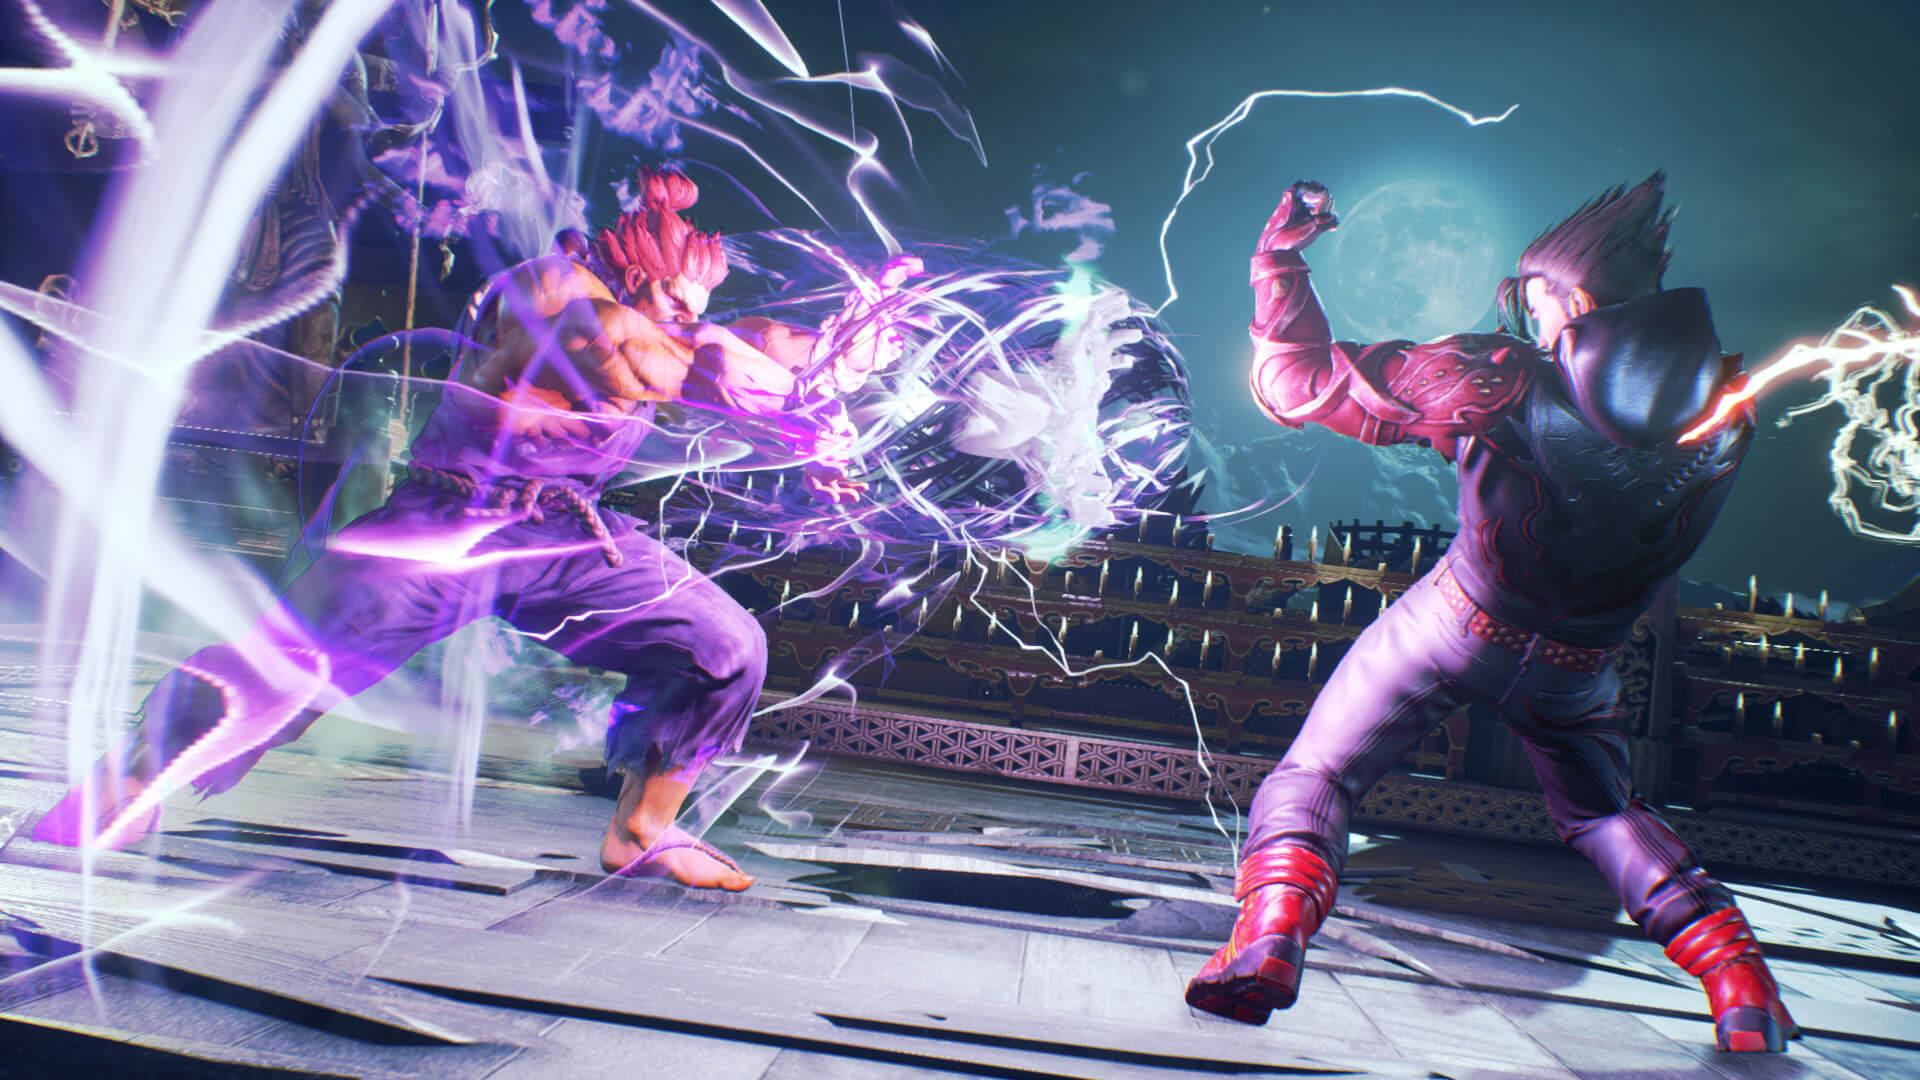 A Blind Tekken 7 Player Reaches The Title of Grandmaster